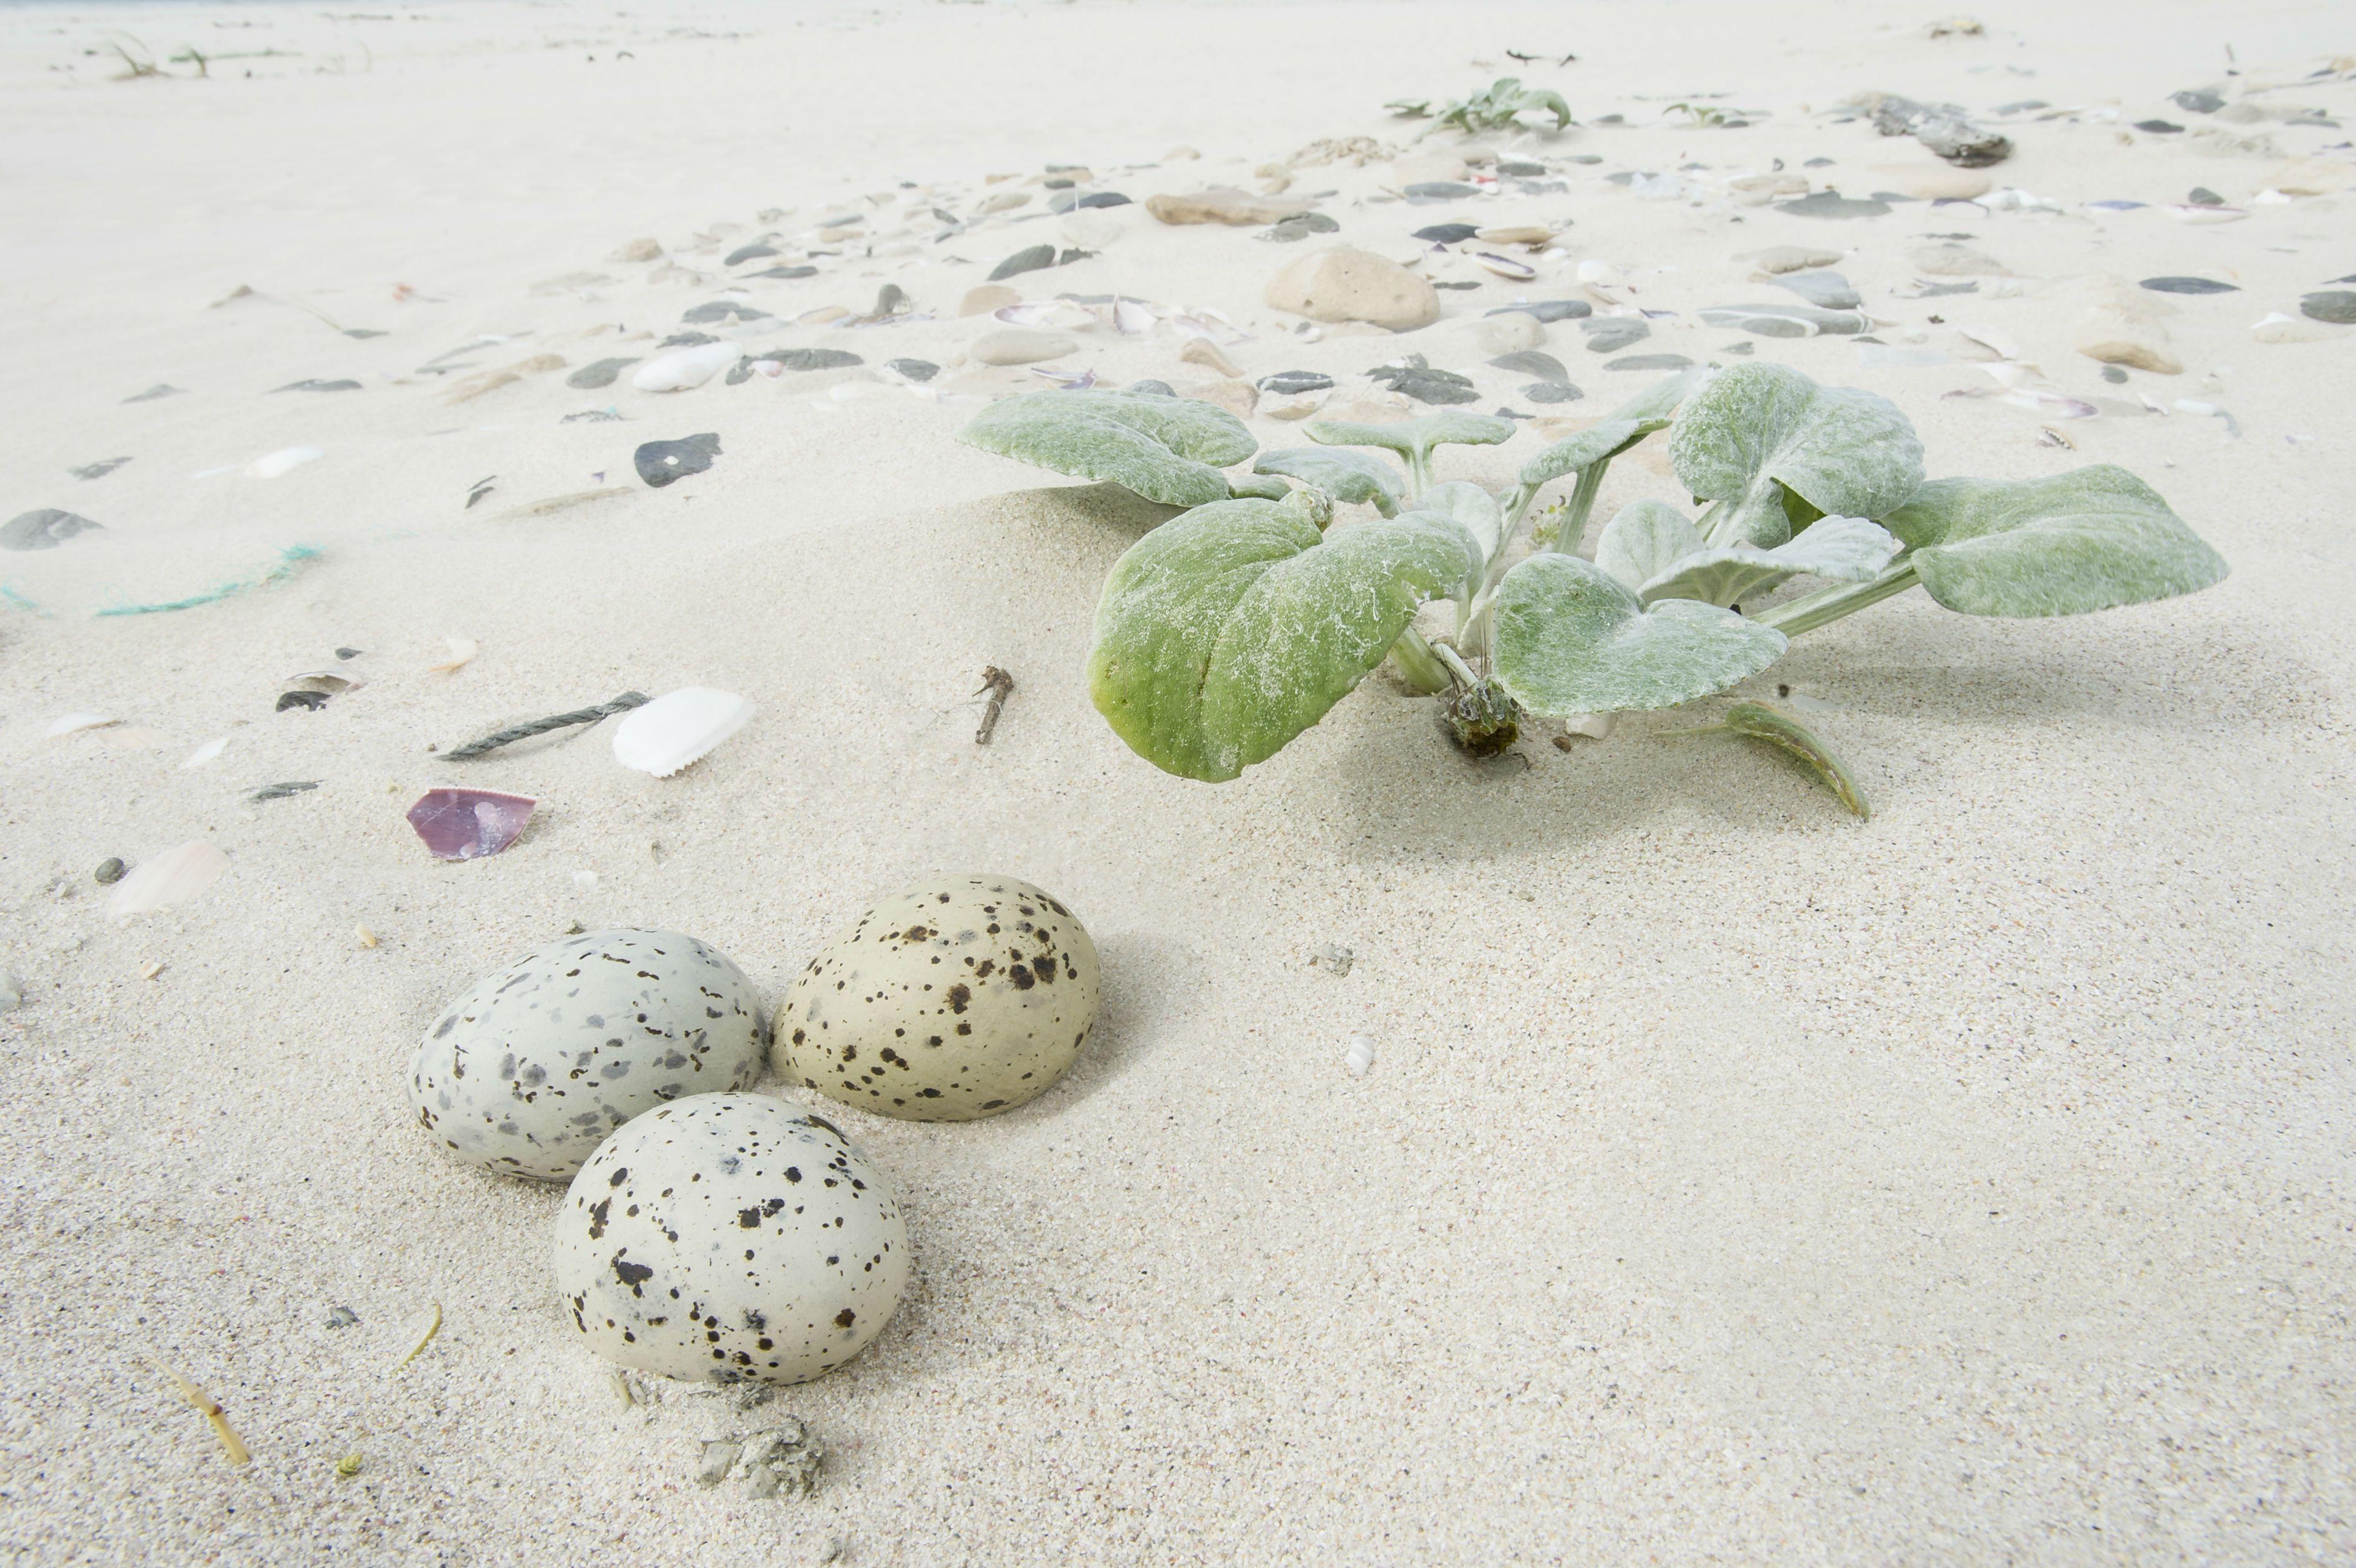 Caspian tern scrape nest